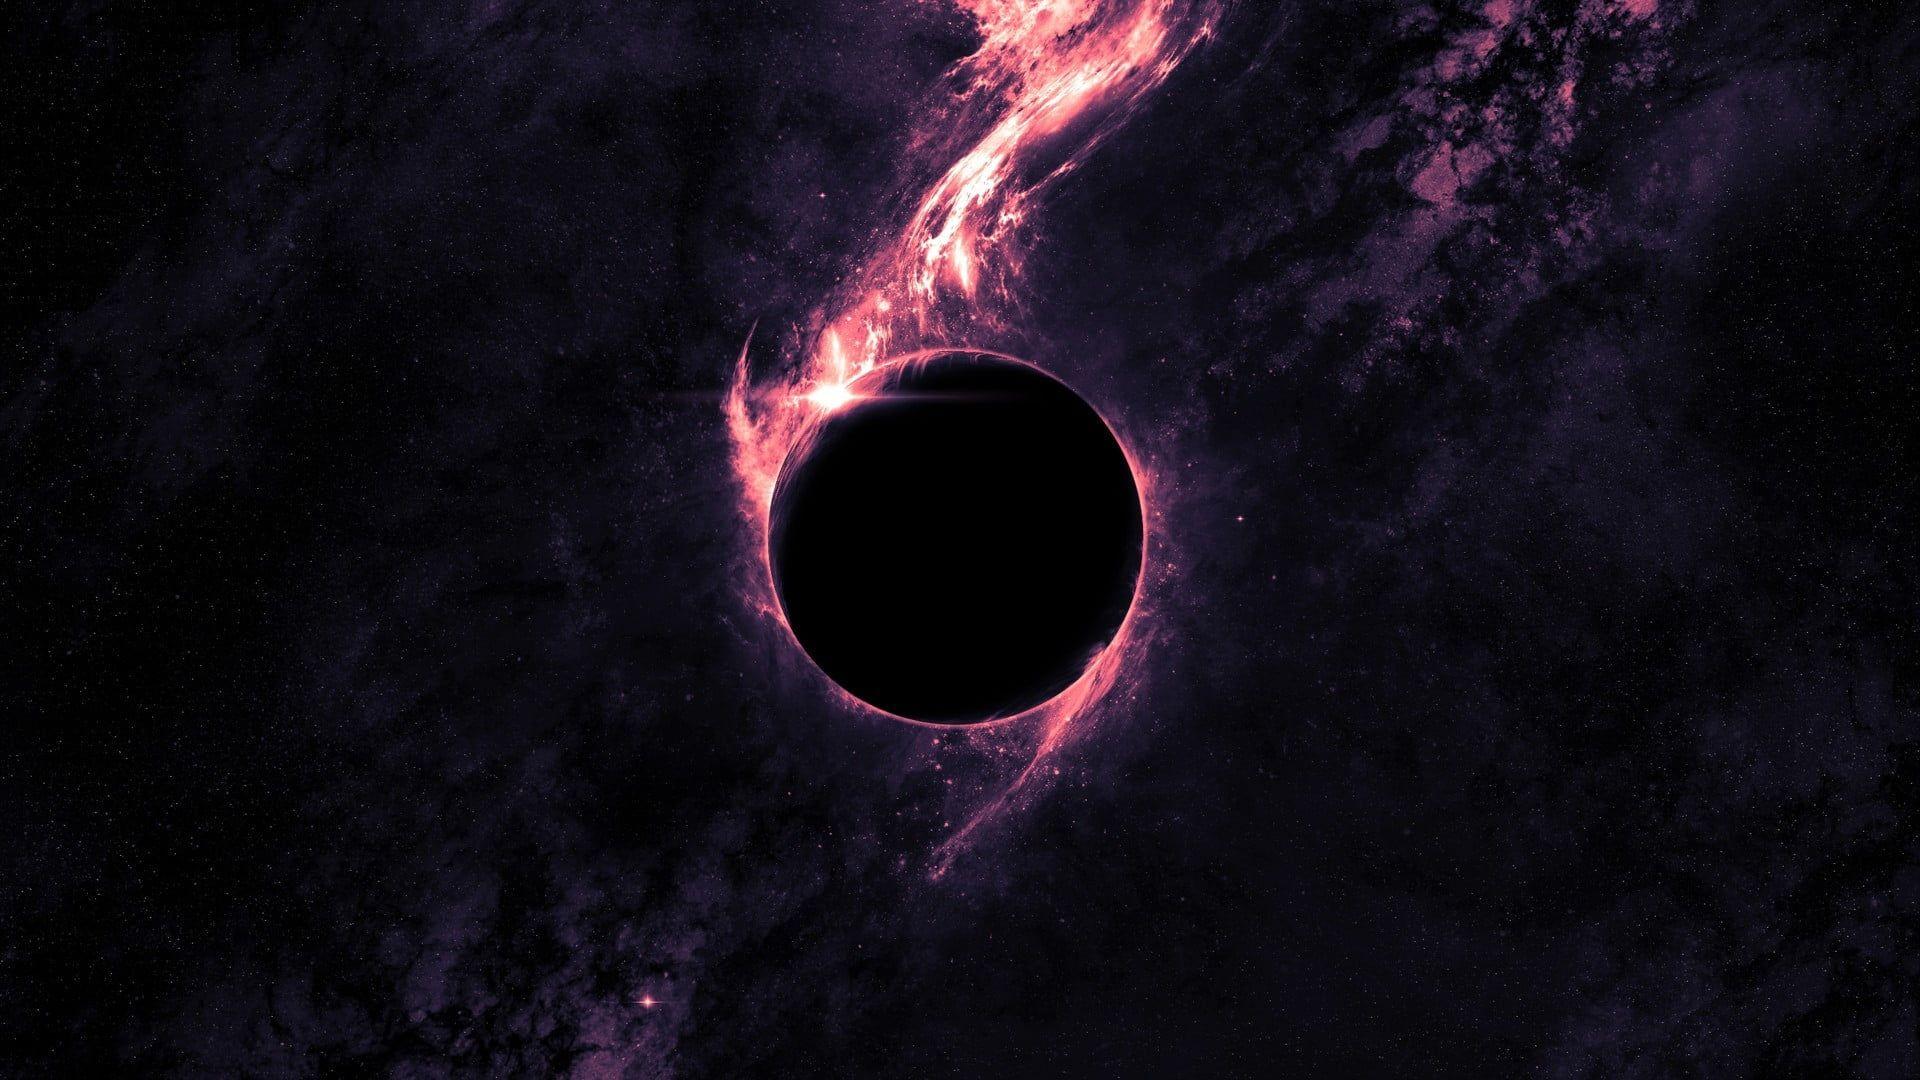 Solar eclipse illustration black hole digital wallpaper space art digital art black holes